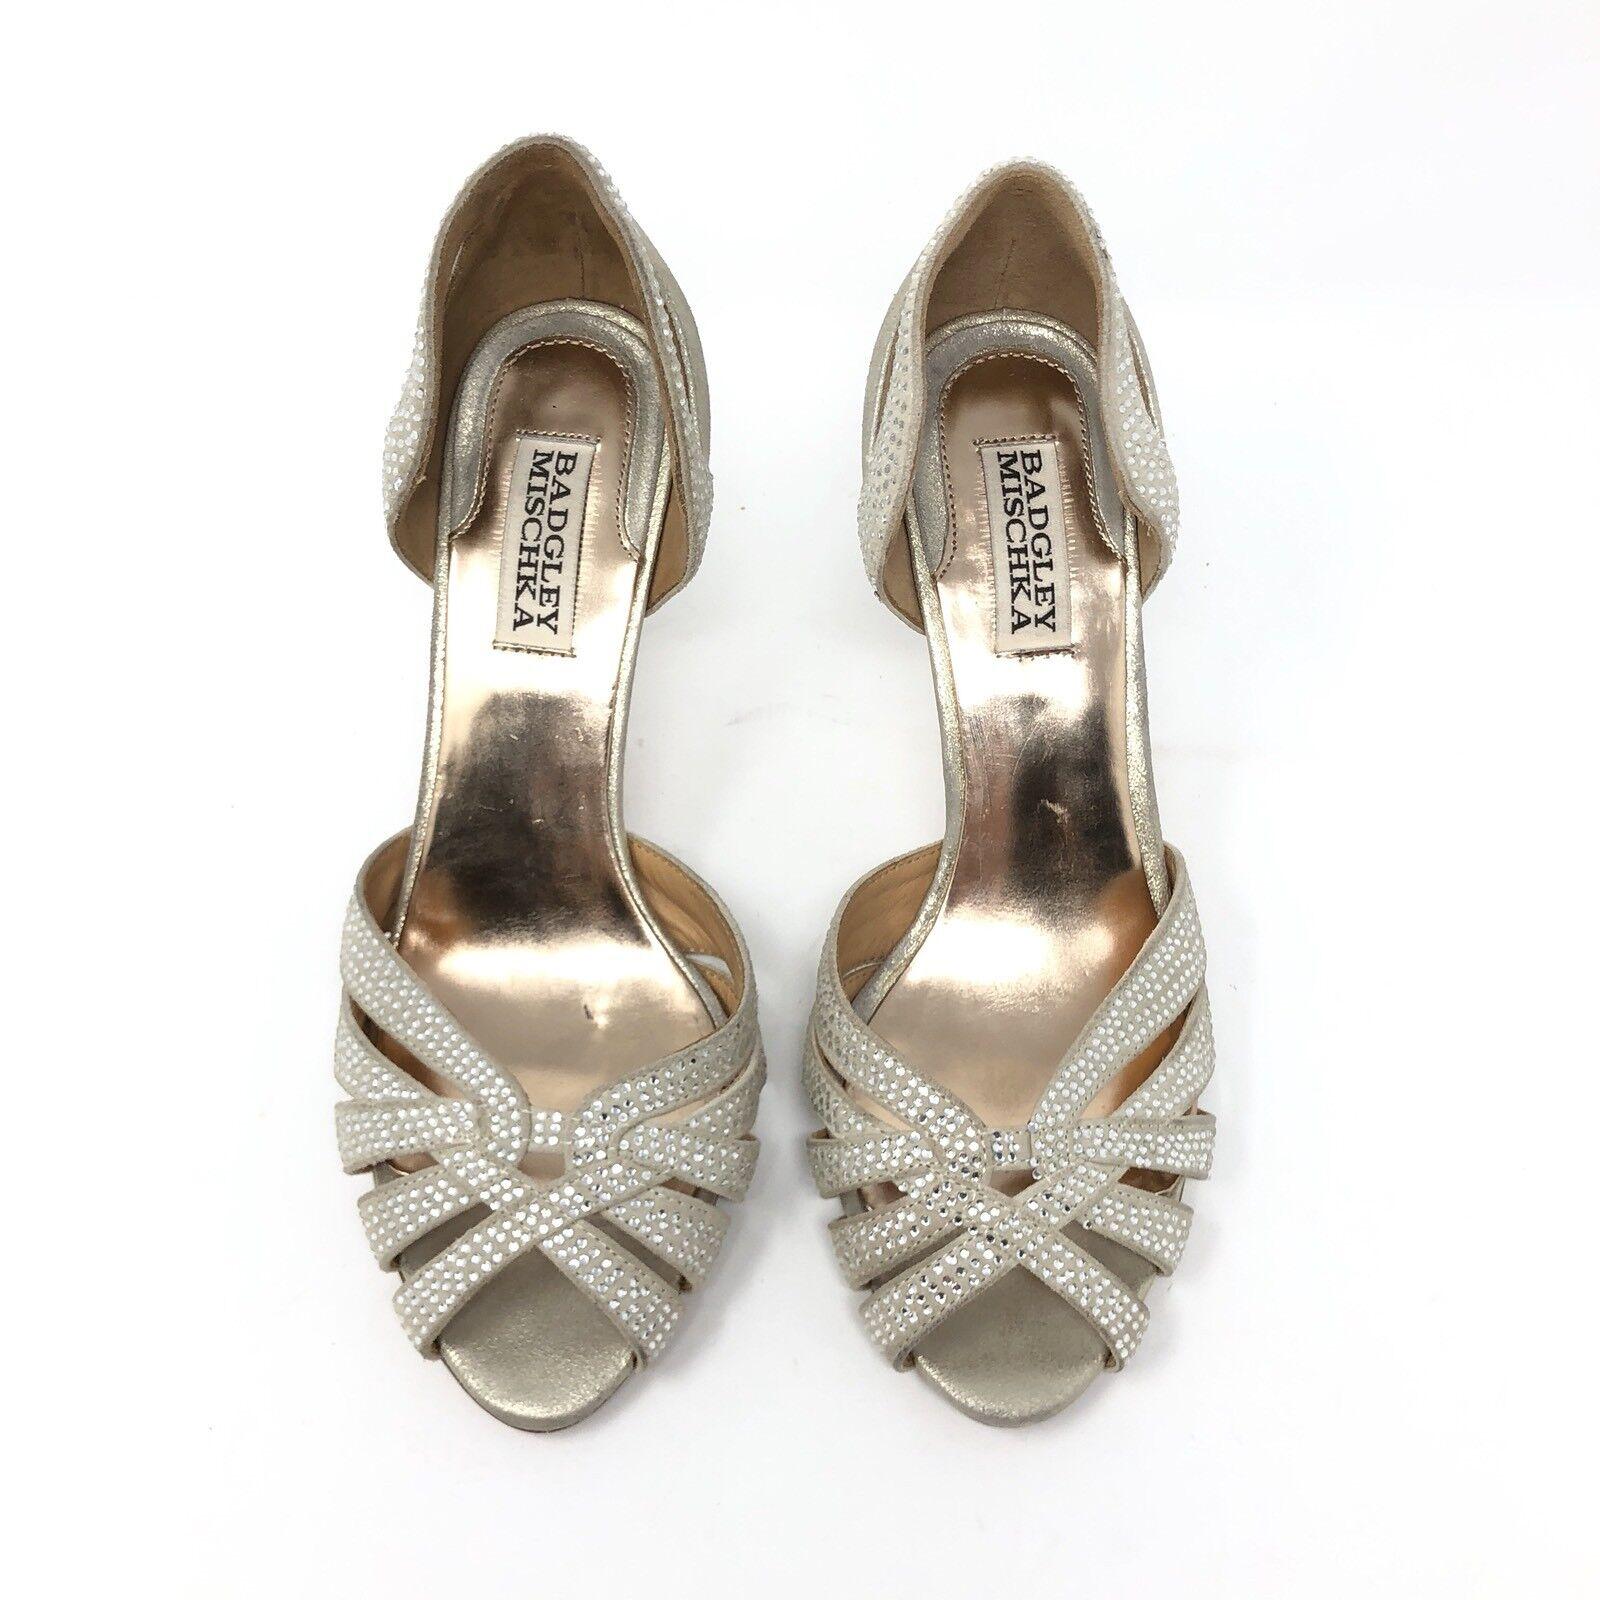 Badgley Mischka Peep Tatiana Gold Jewels D'Orsay Peep Mischka Toe Heels Bridal Damens Größe 7.5 3c0b0a